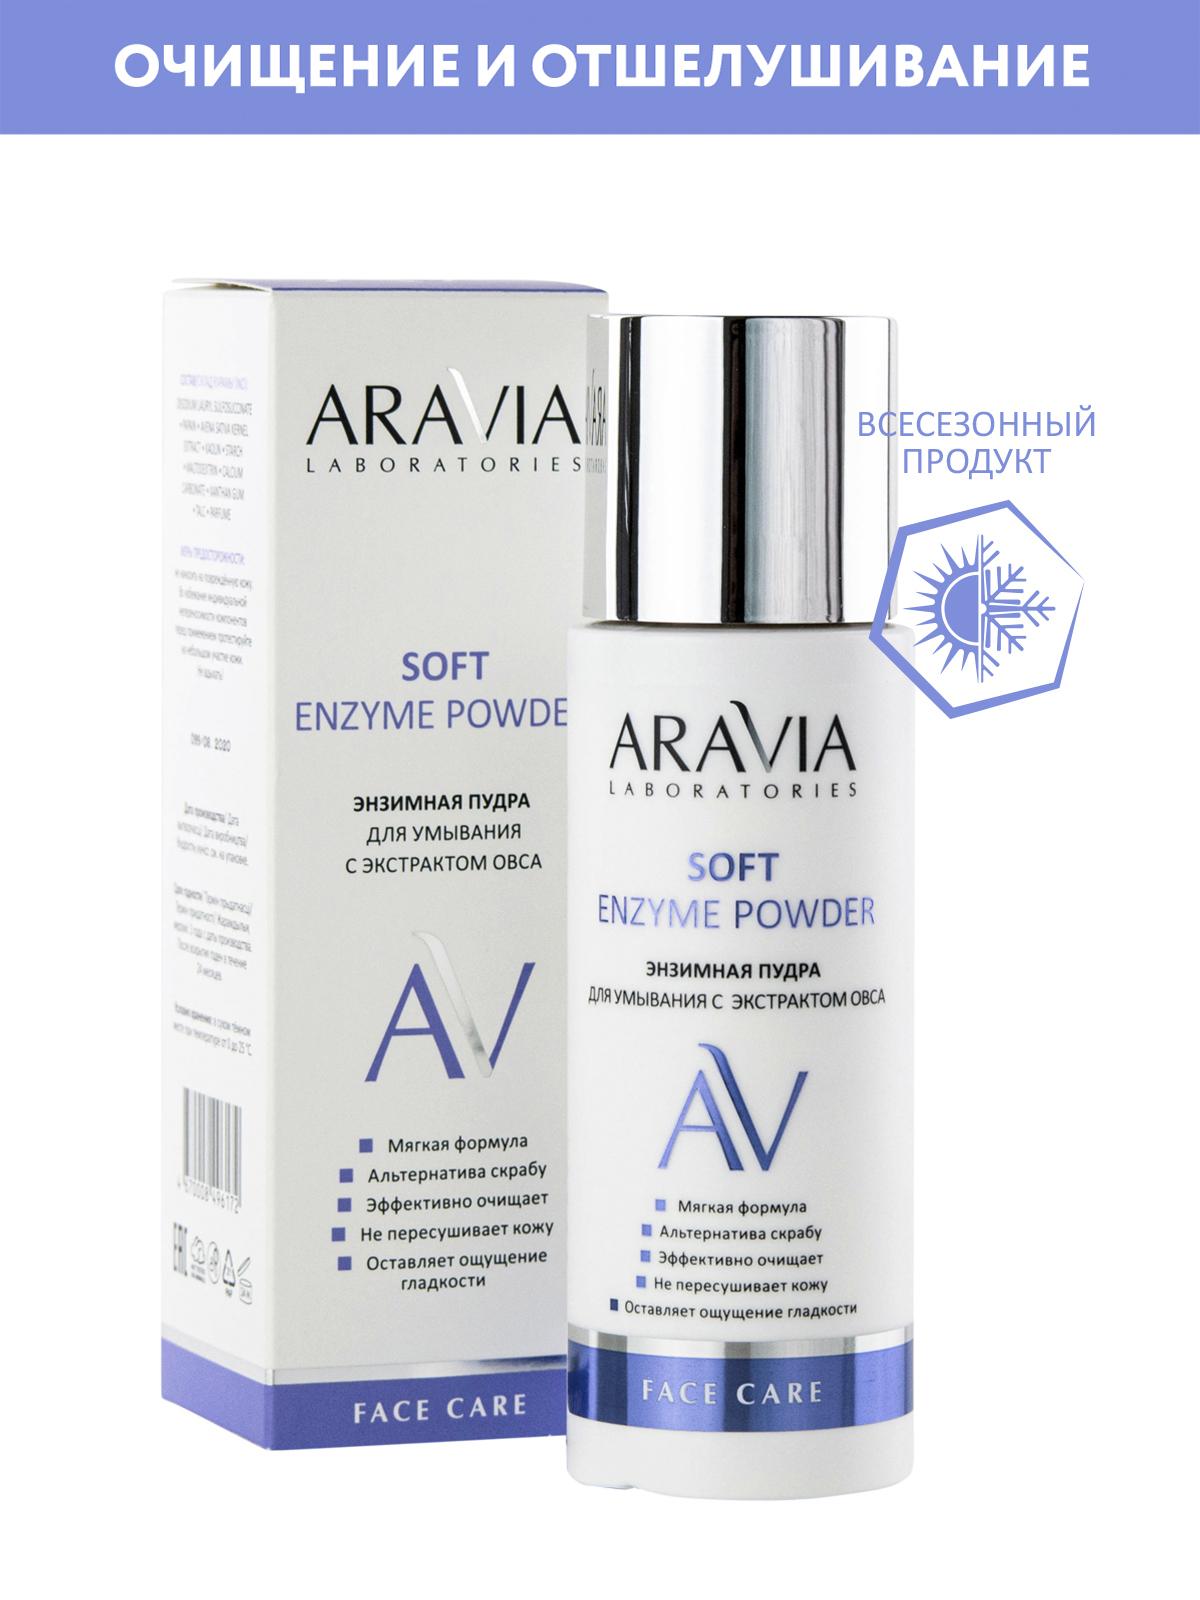 ARAVIA Laboratories Энзимная пудра для умывания с экстрактом овса Soft Enzyme Powder, 150 мл